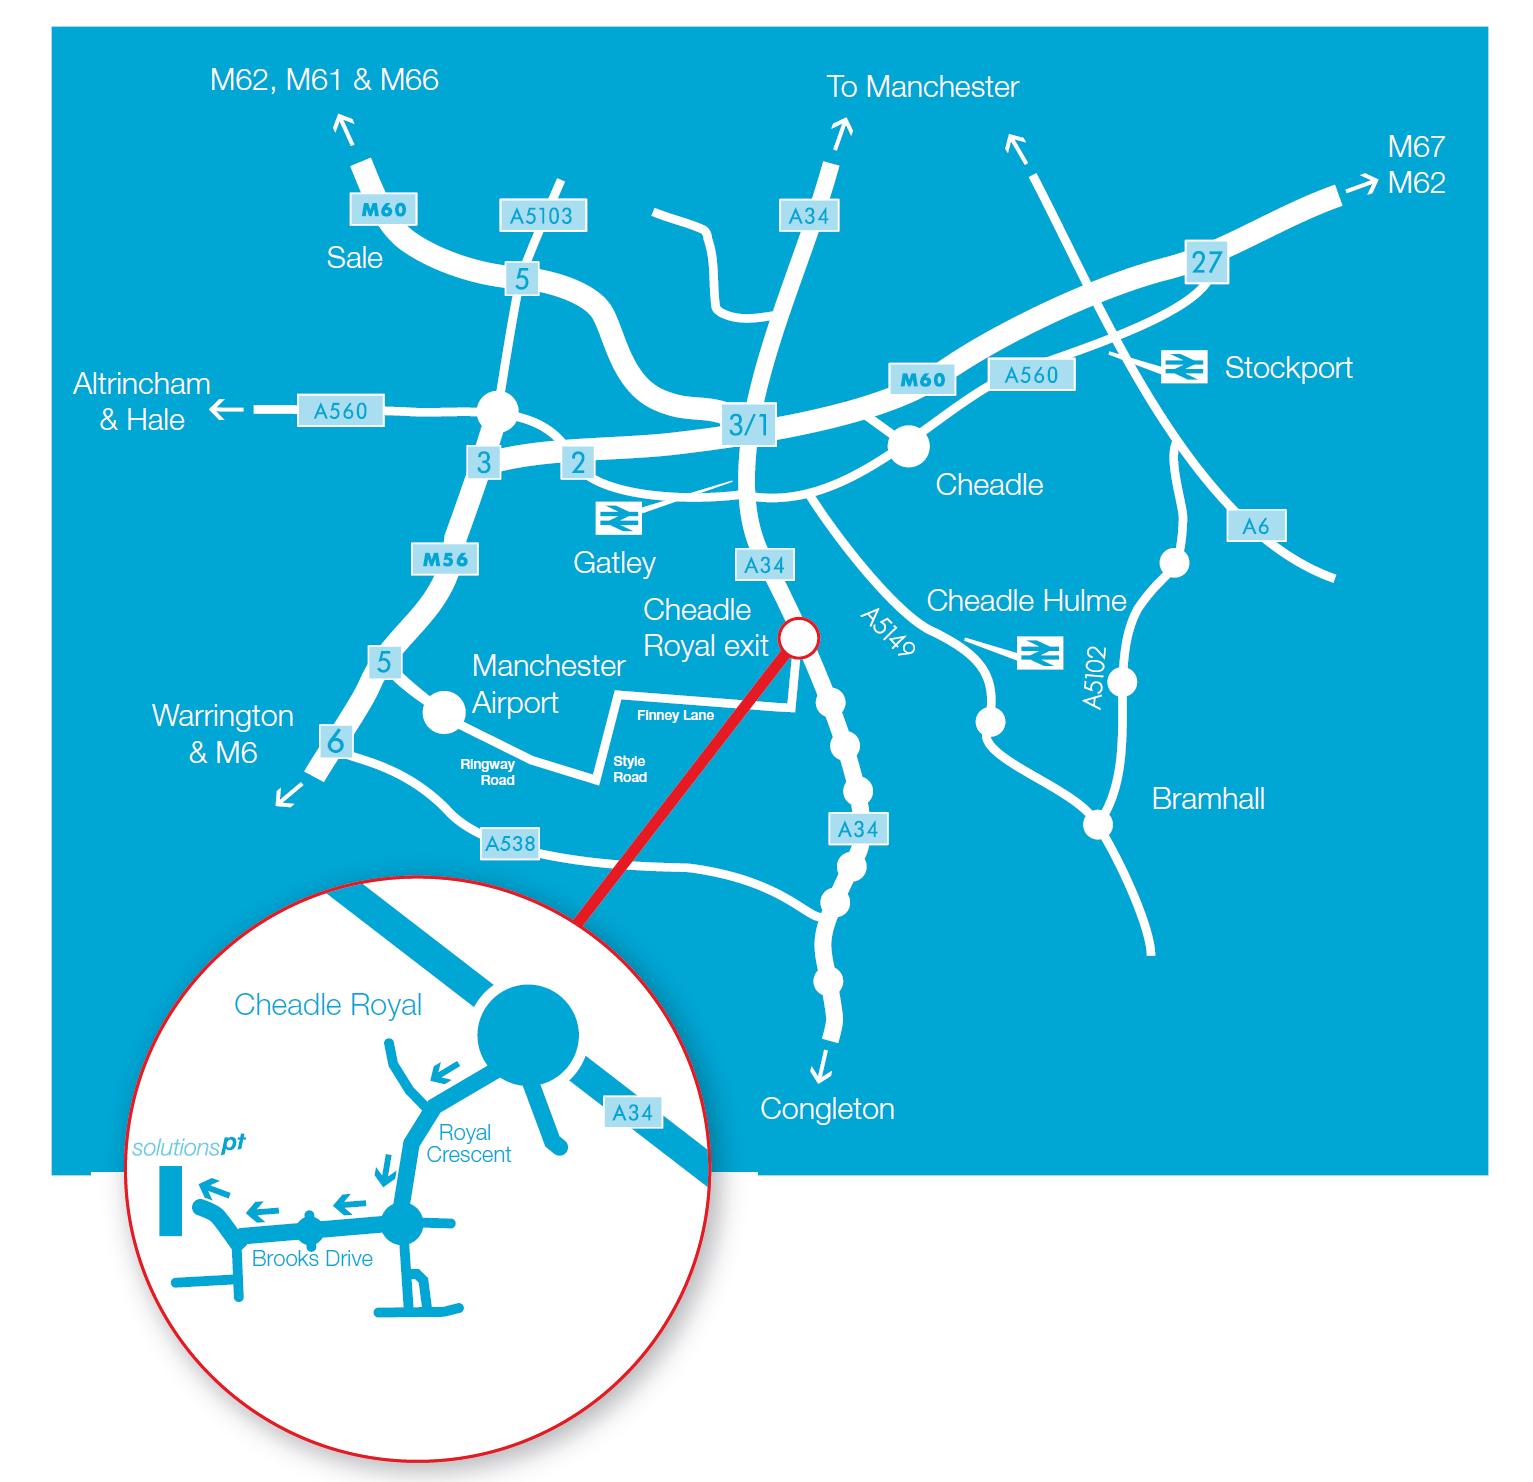 Solutionspt-map2-1